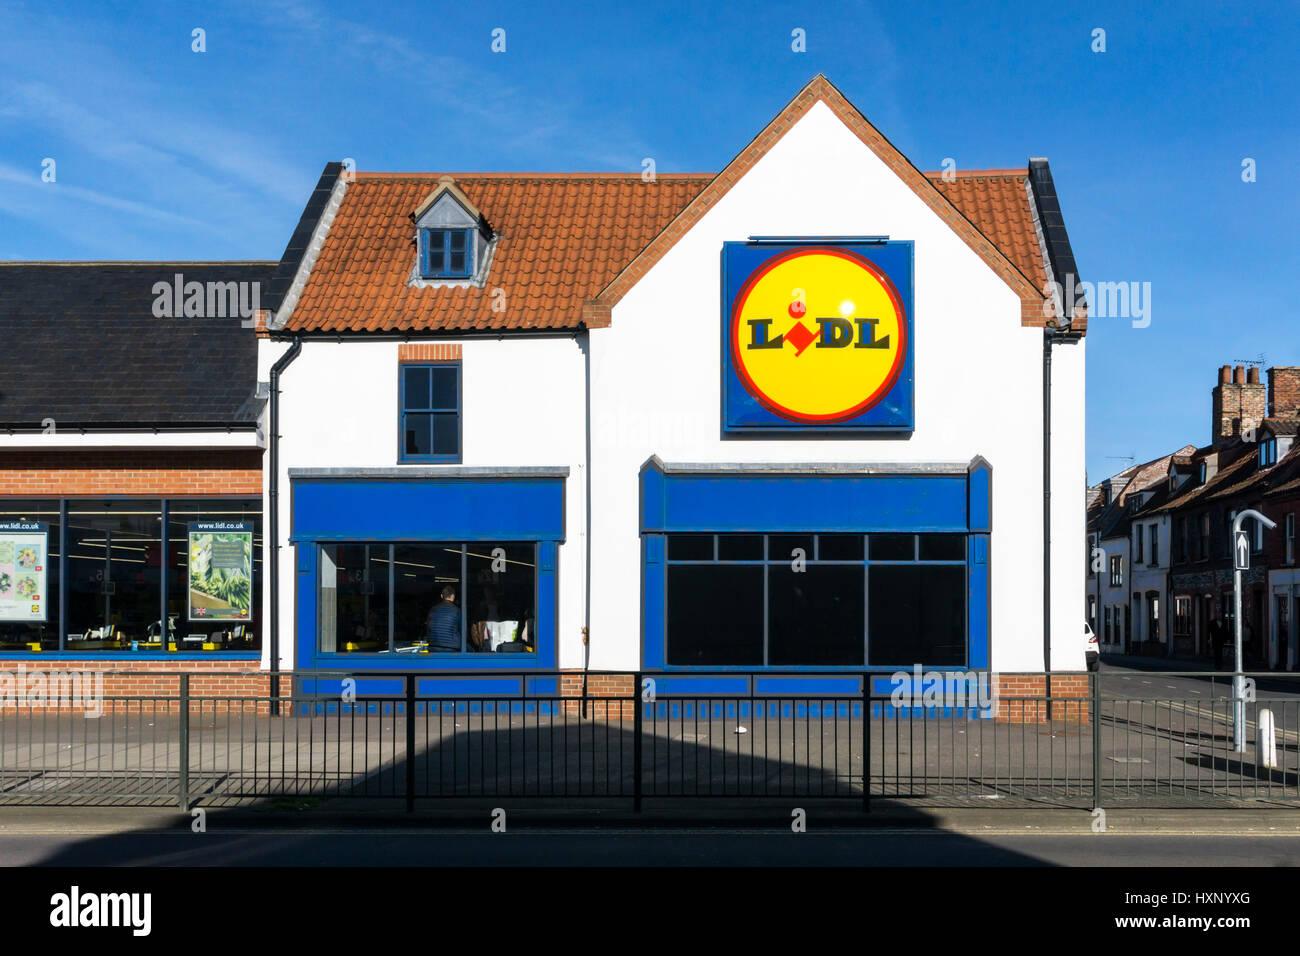 Branch of Lidl supermarkets in King's Lynn, Norfolk, UK - Stock Image